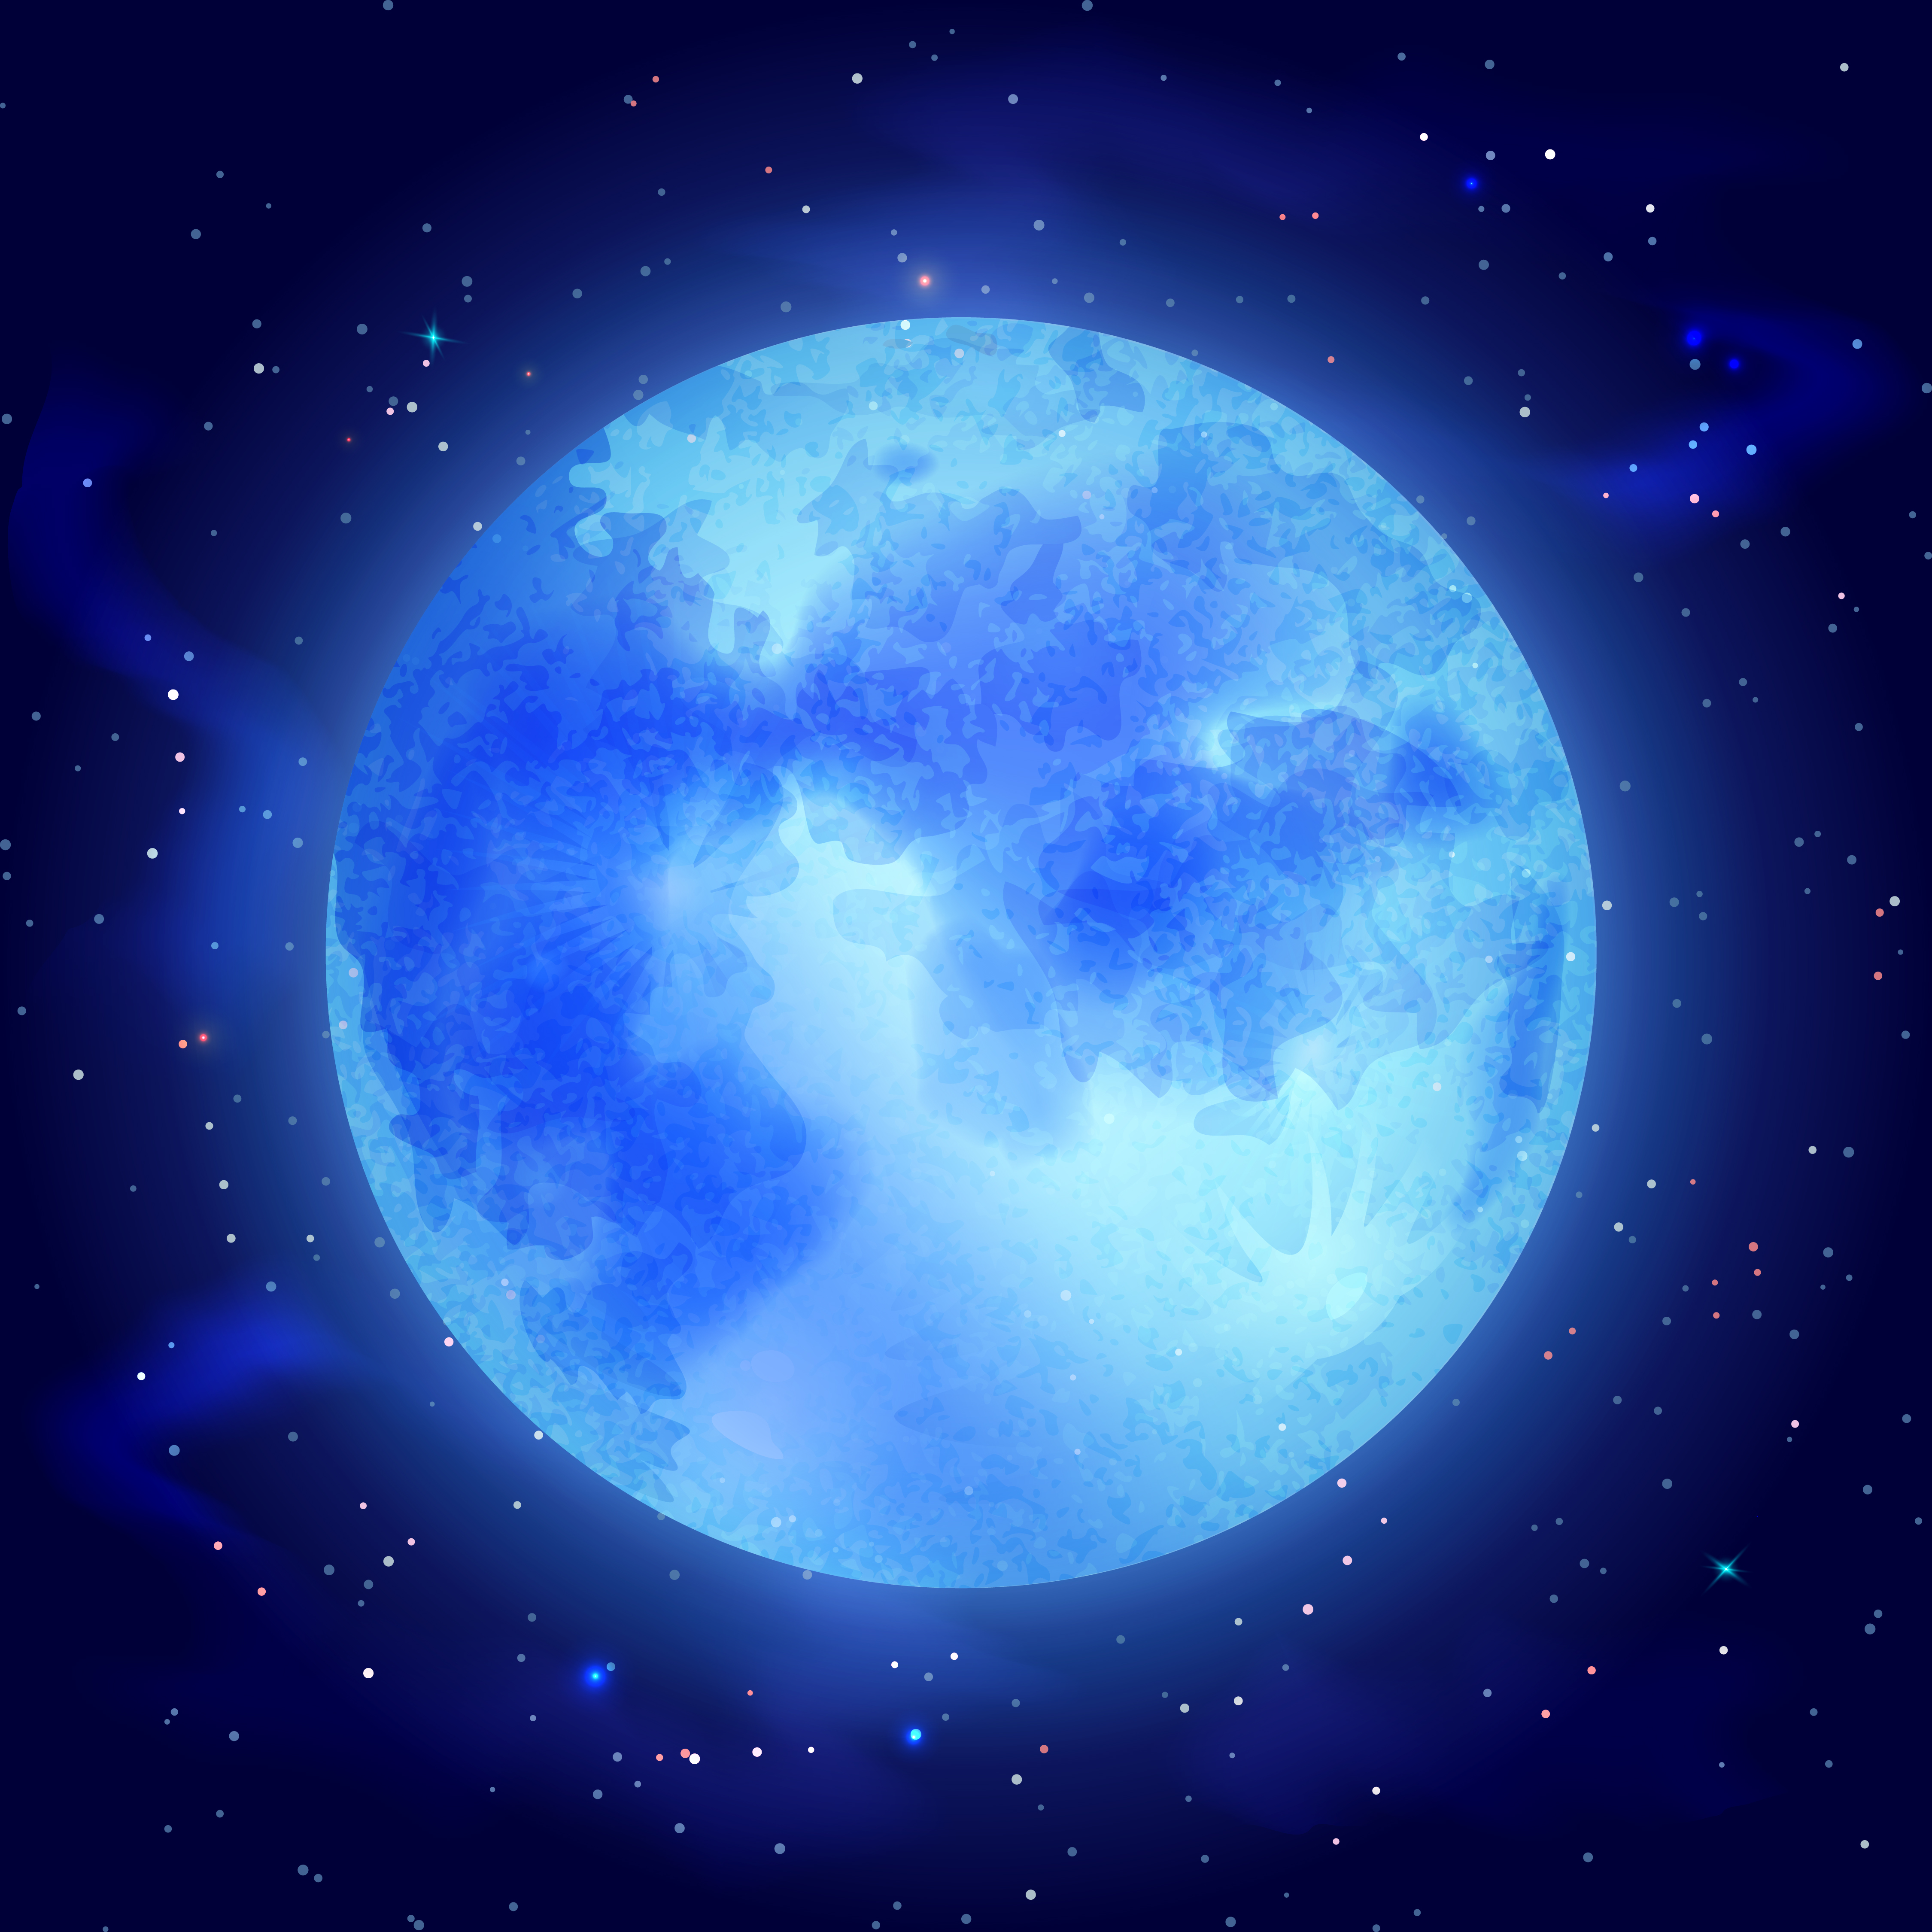 Luna star full